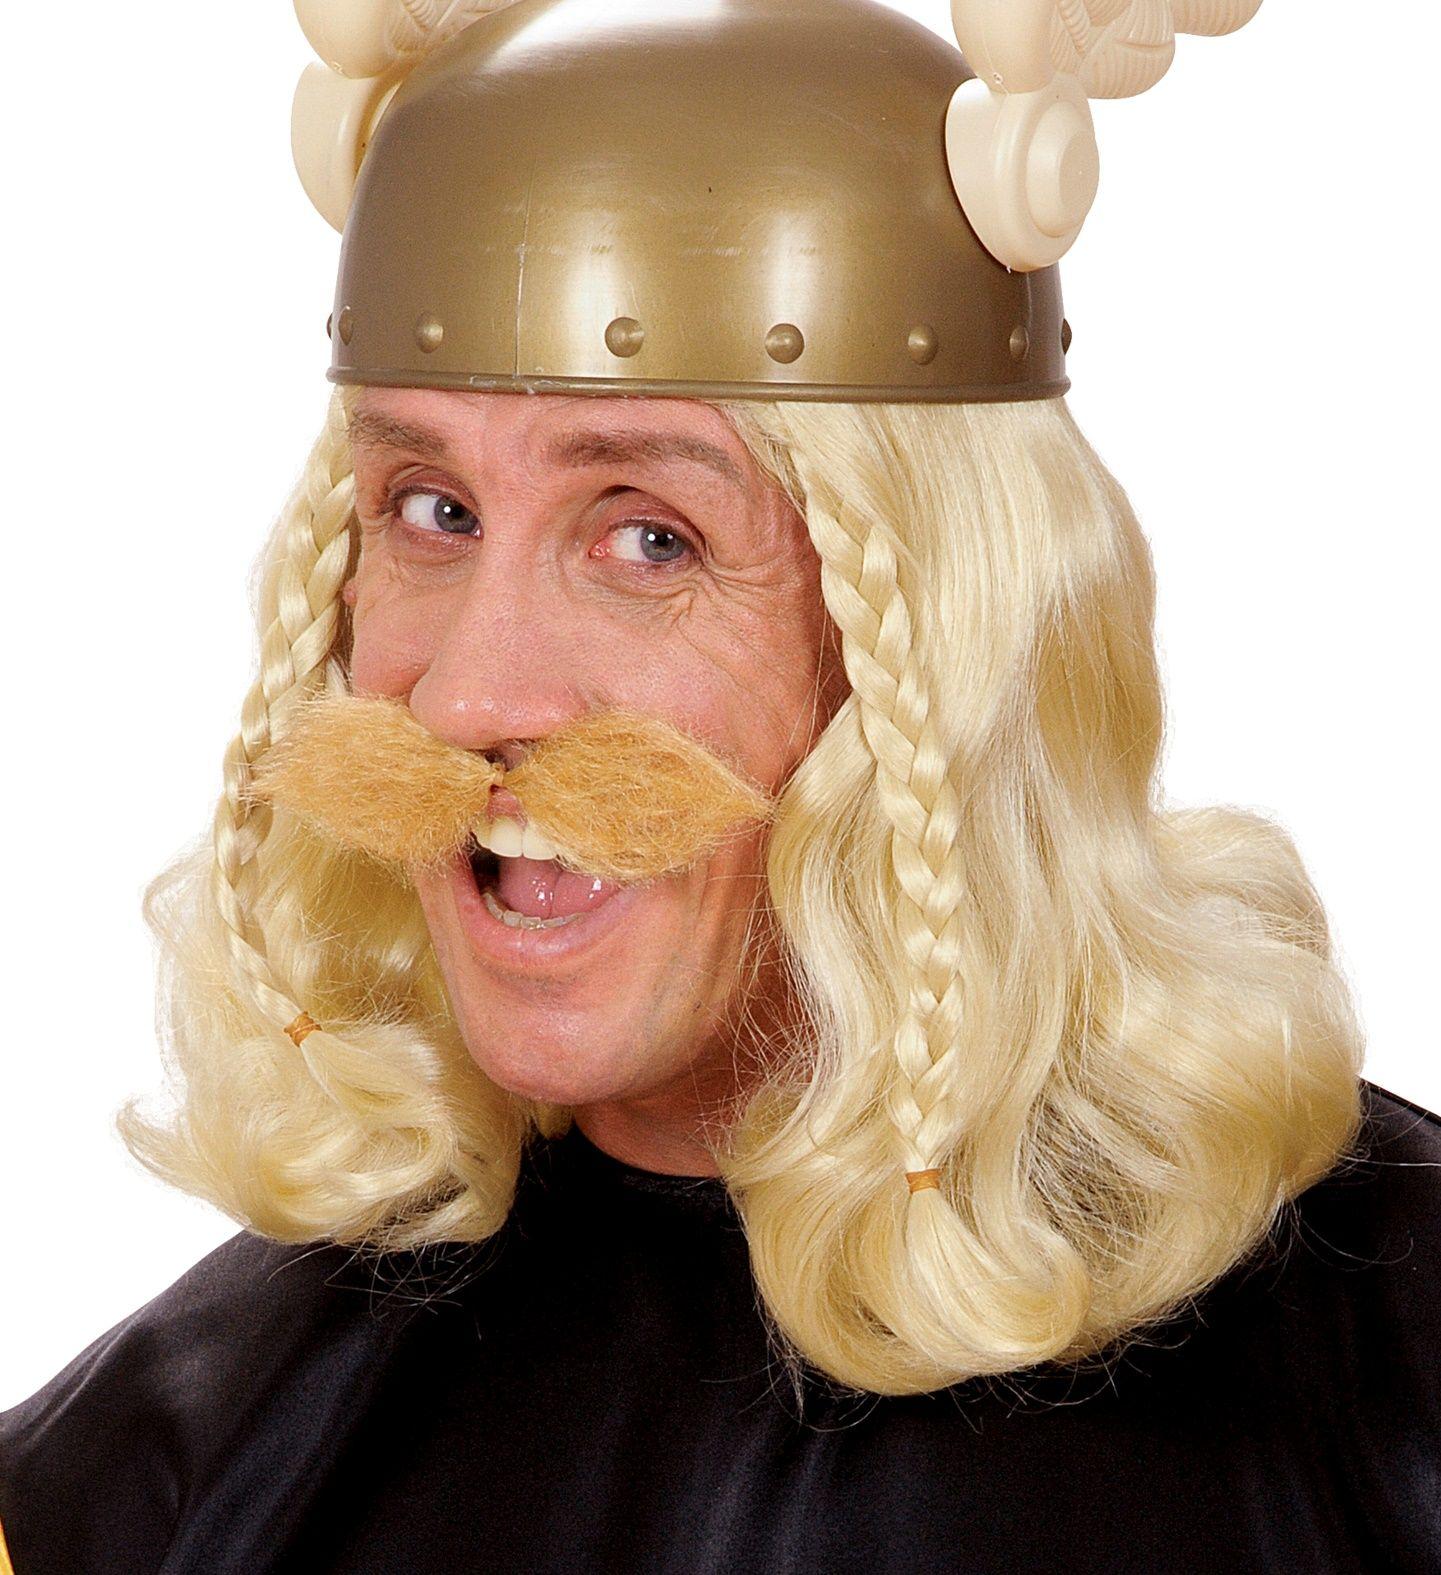 Grote blonde viking snor